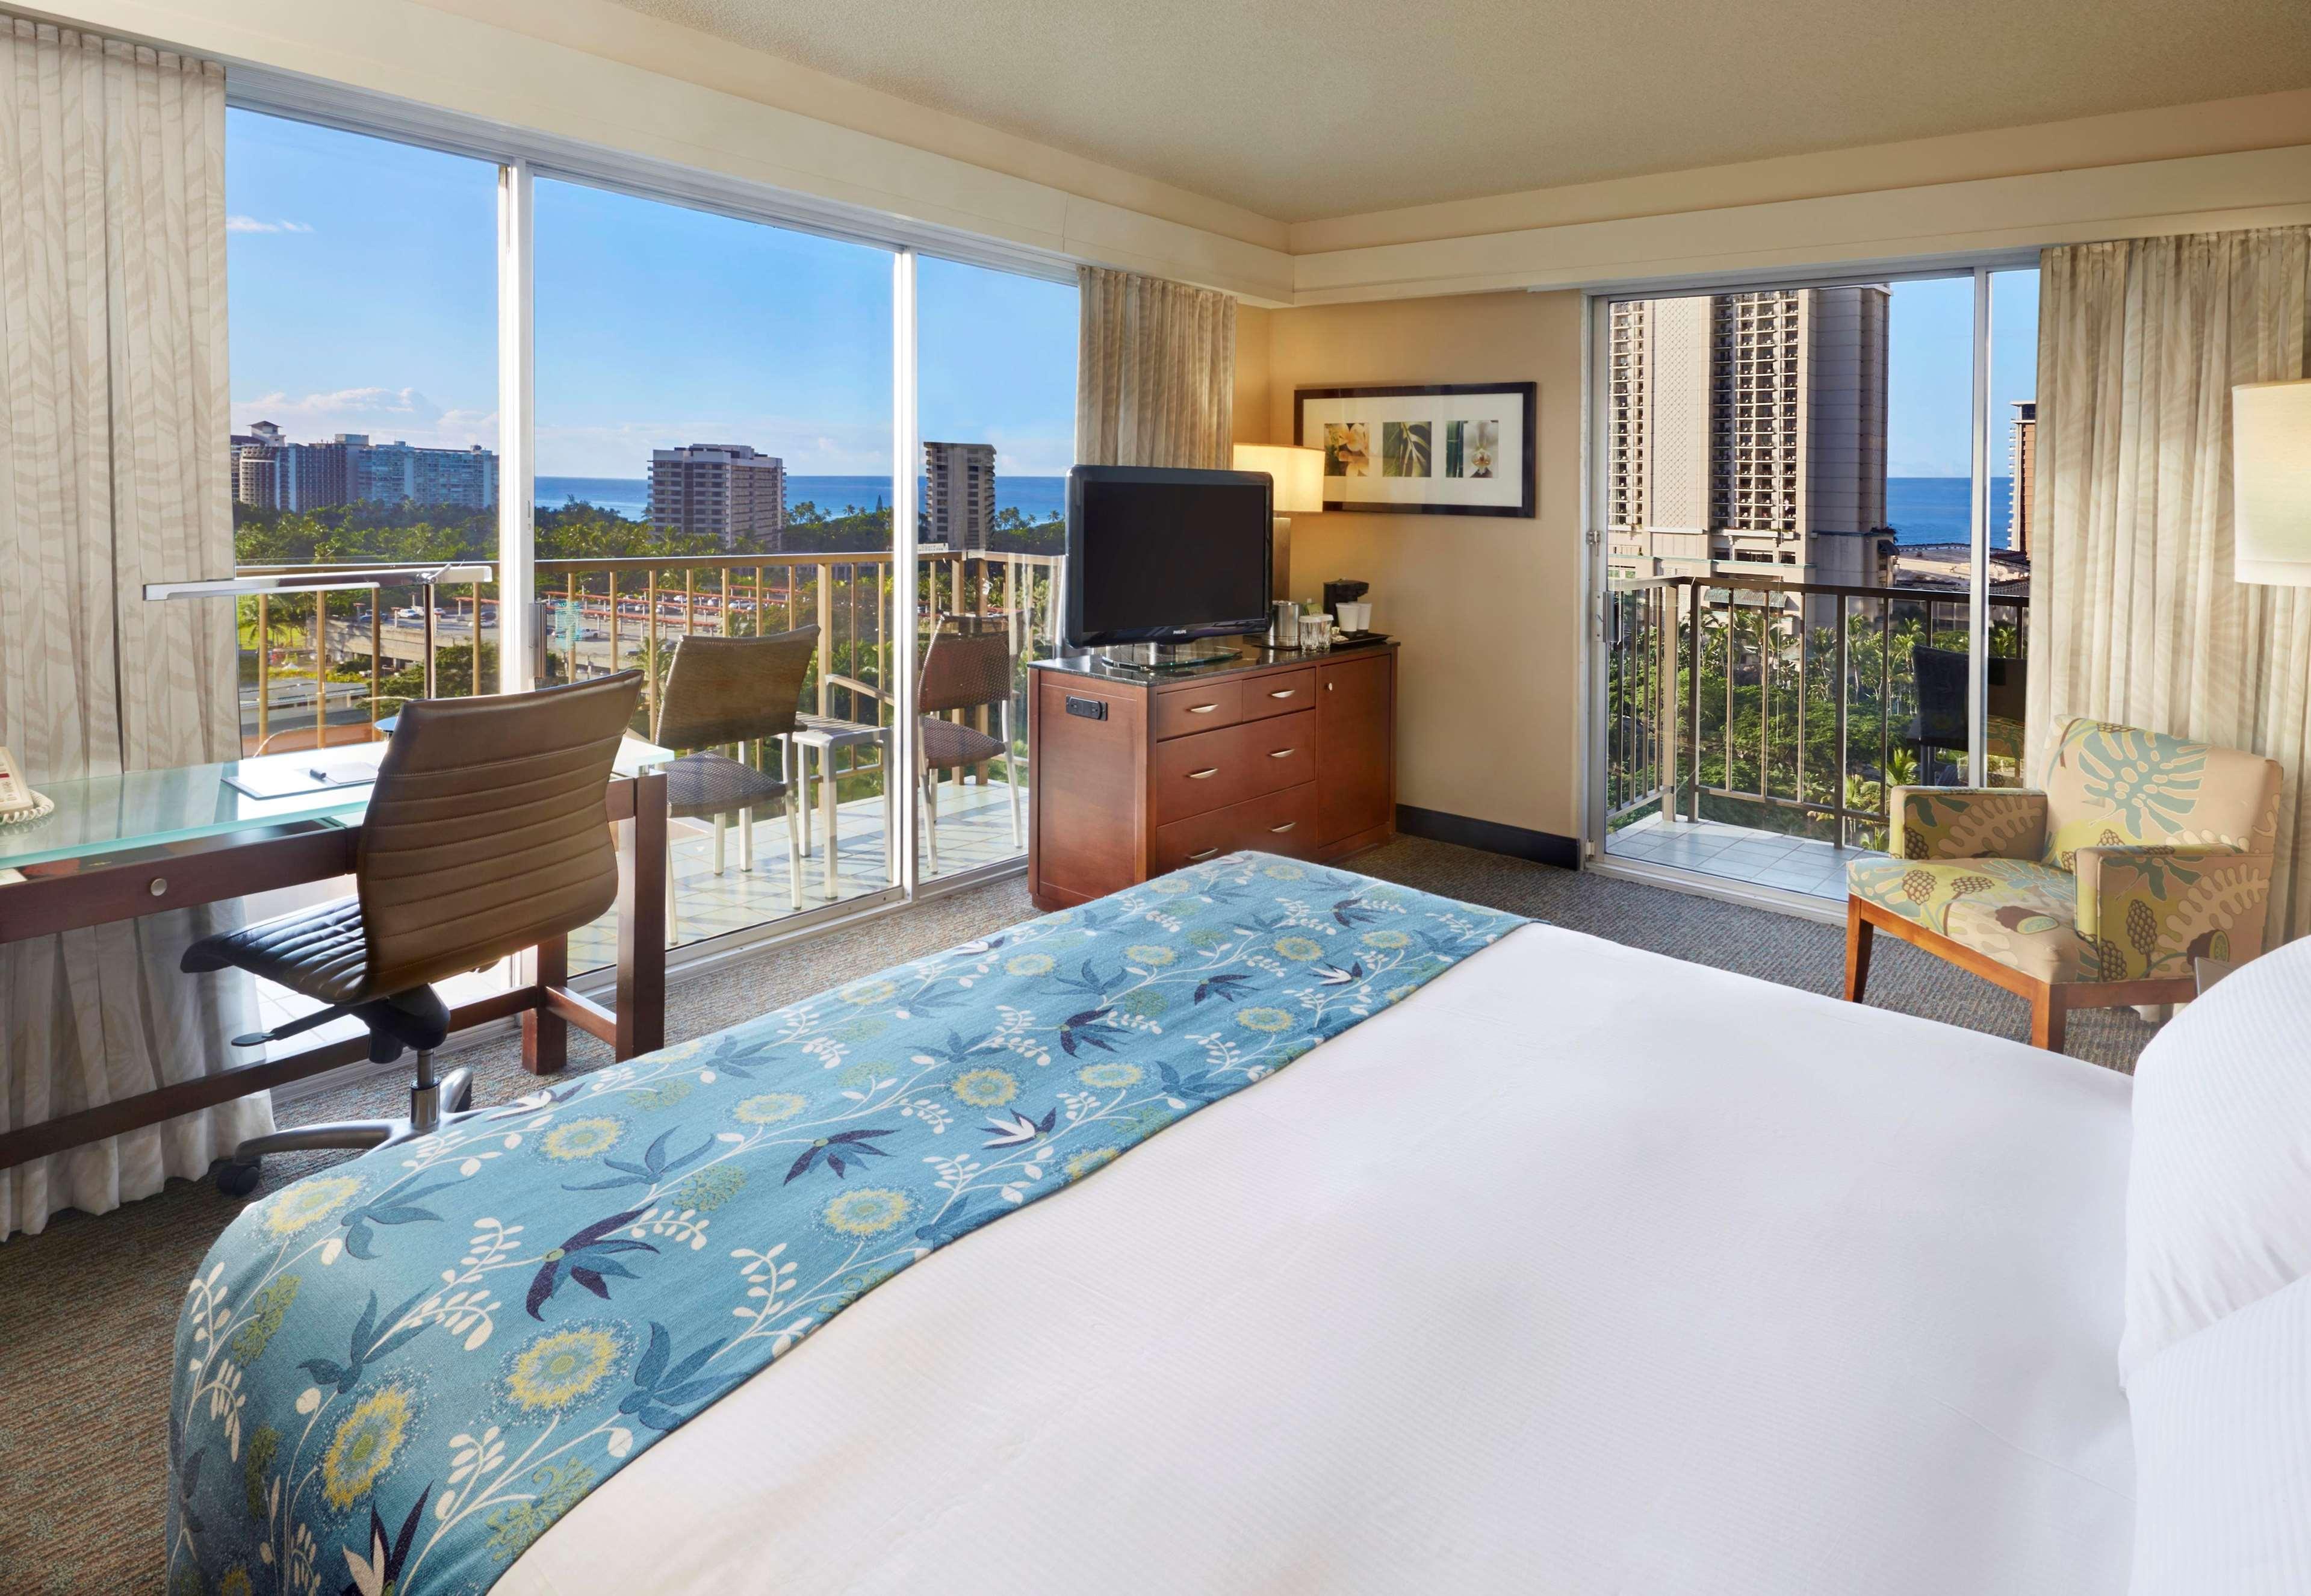 DoubleTree by Hilton Hotel Alana - Waikiki Beach image 17